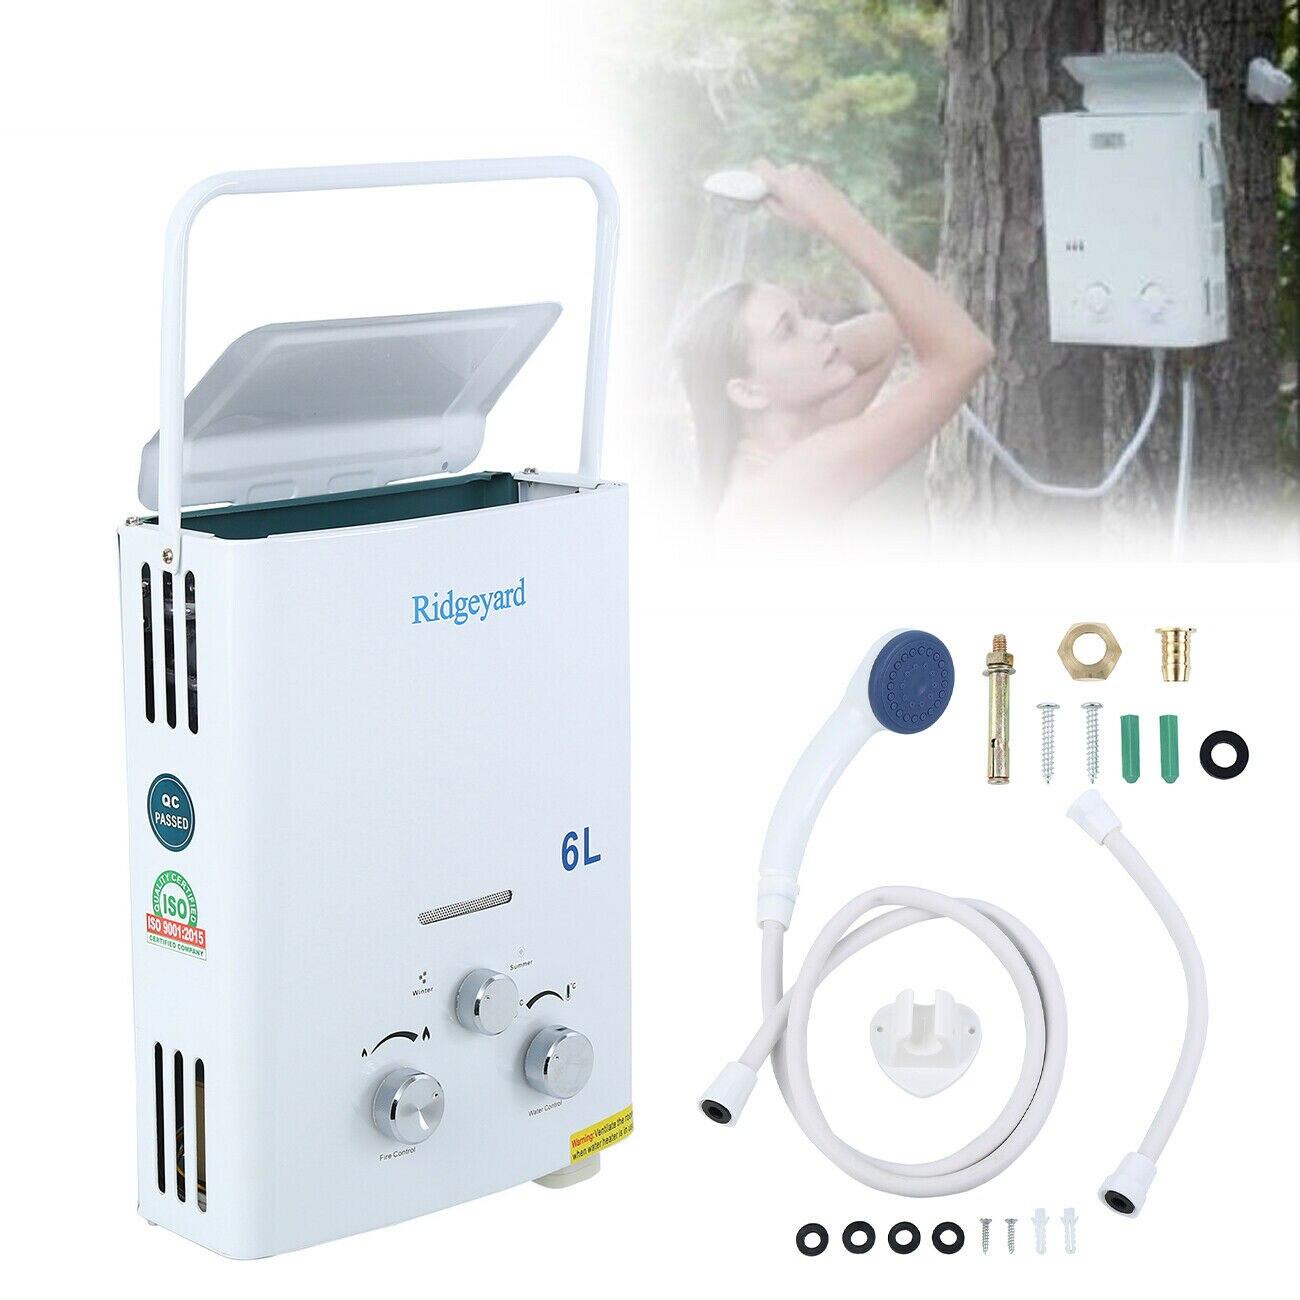 6L LPG Gas propano calentador de agua sin tanque instantáneo baño con cabezal de ducha calentador de agua caliente caldera calorificador EU envío